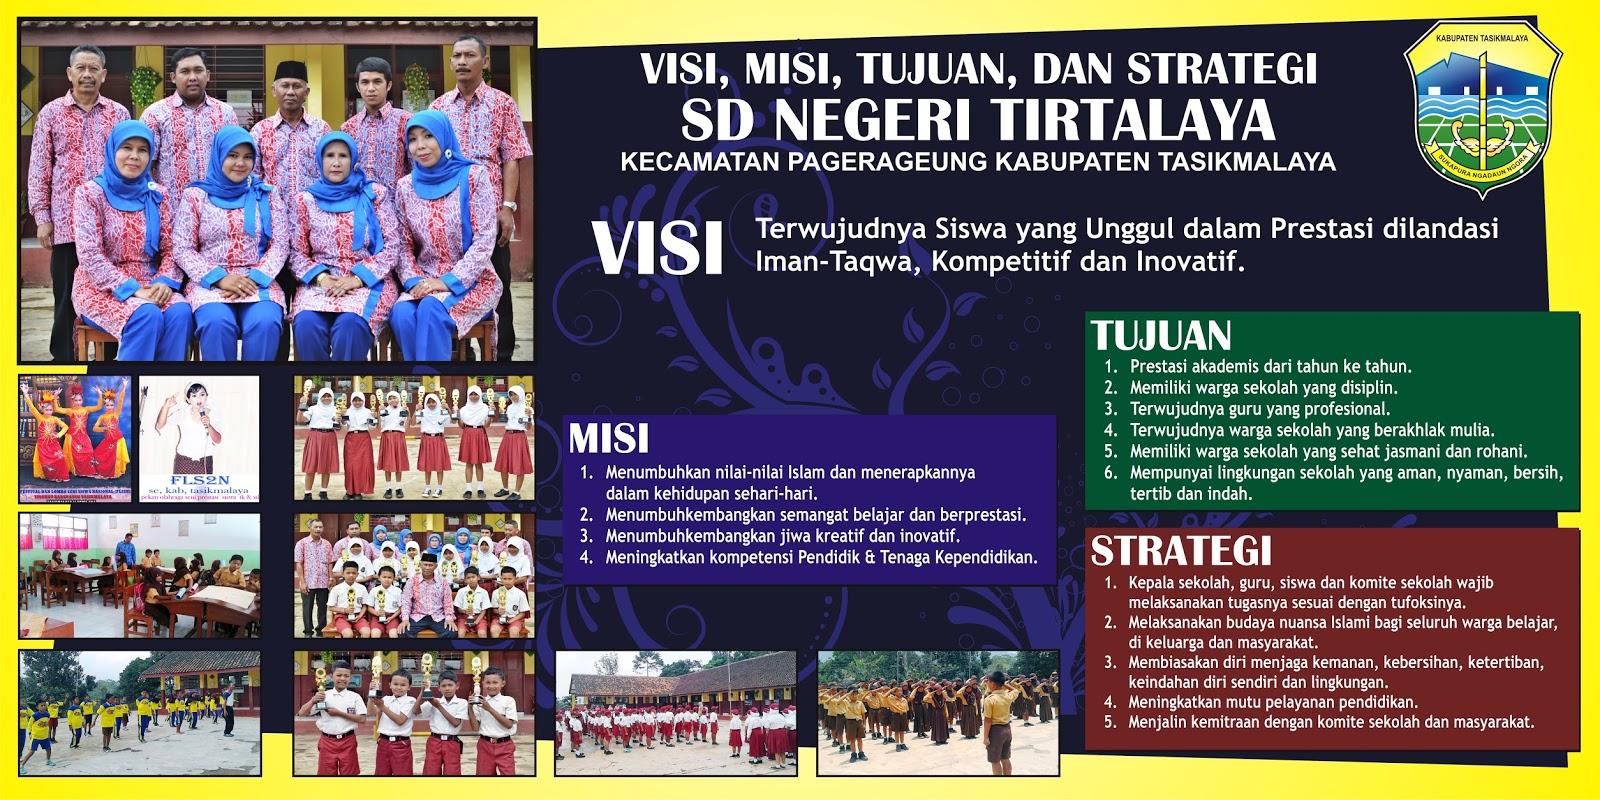 Download Contoh Banner Visi Misi Sekolah Dasar cdr   KARYAKU